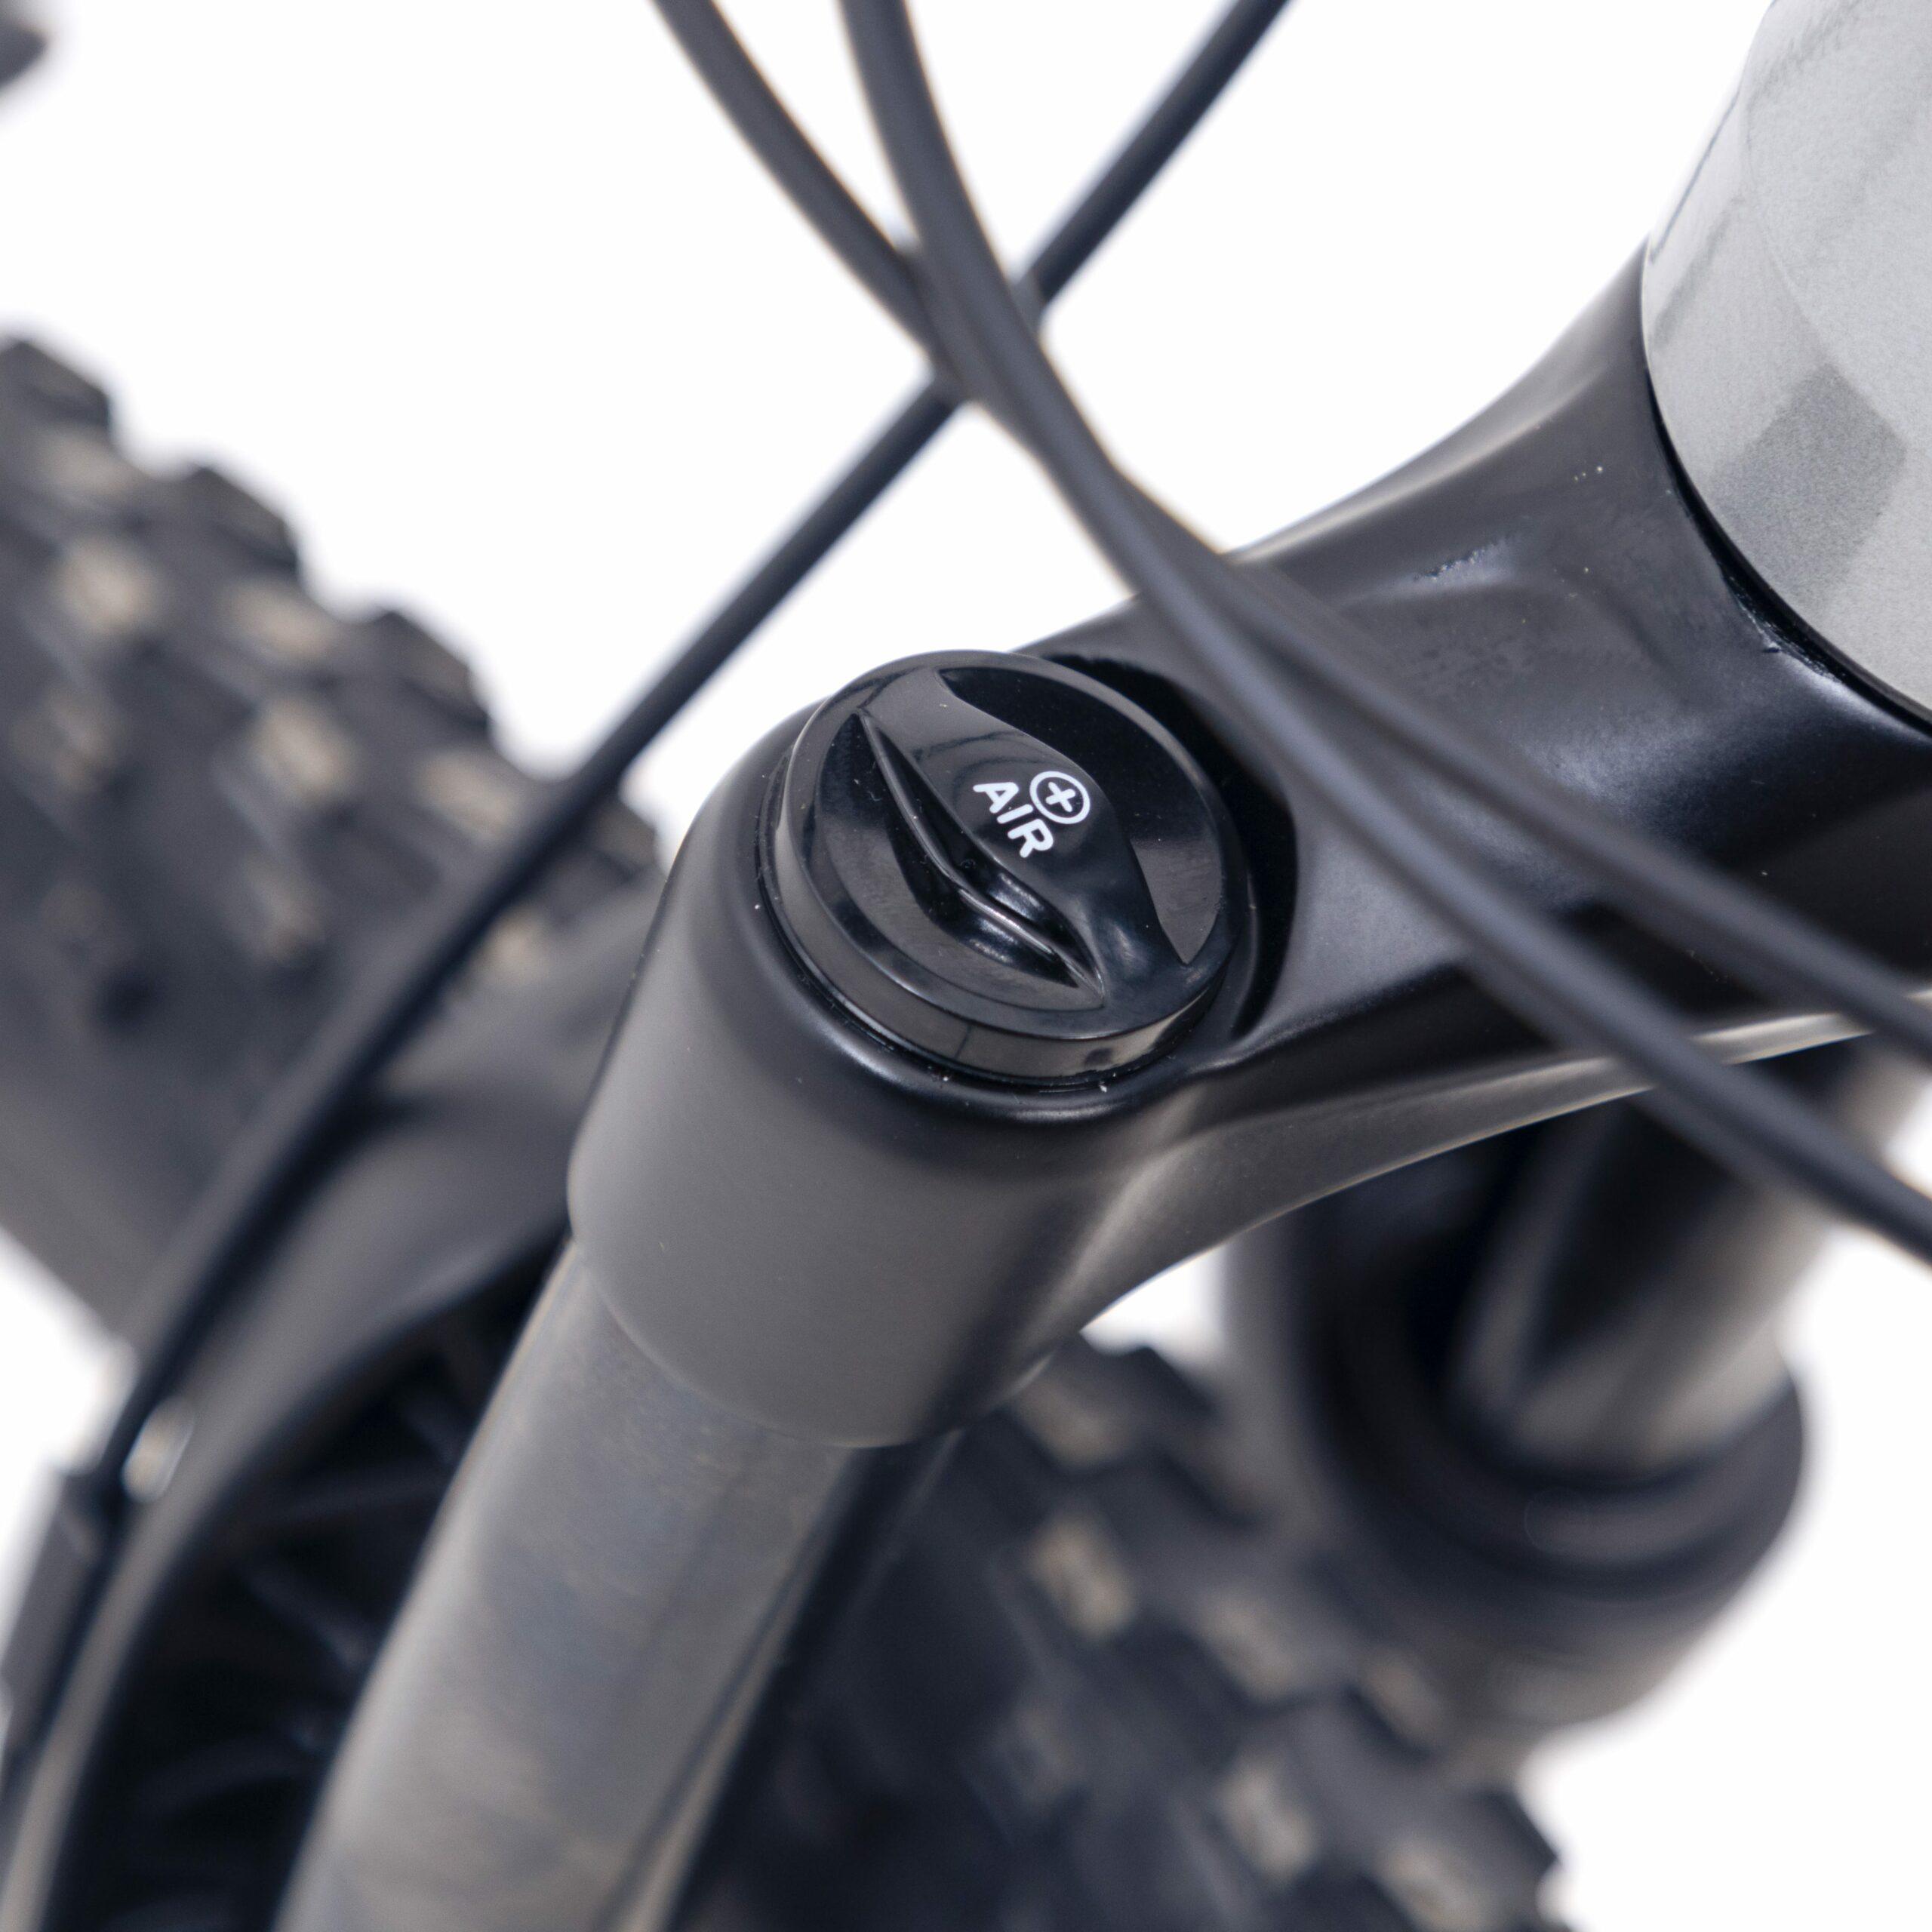 Bicicleta TSW Yukon | GX-SM | 2021/2022 8